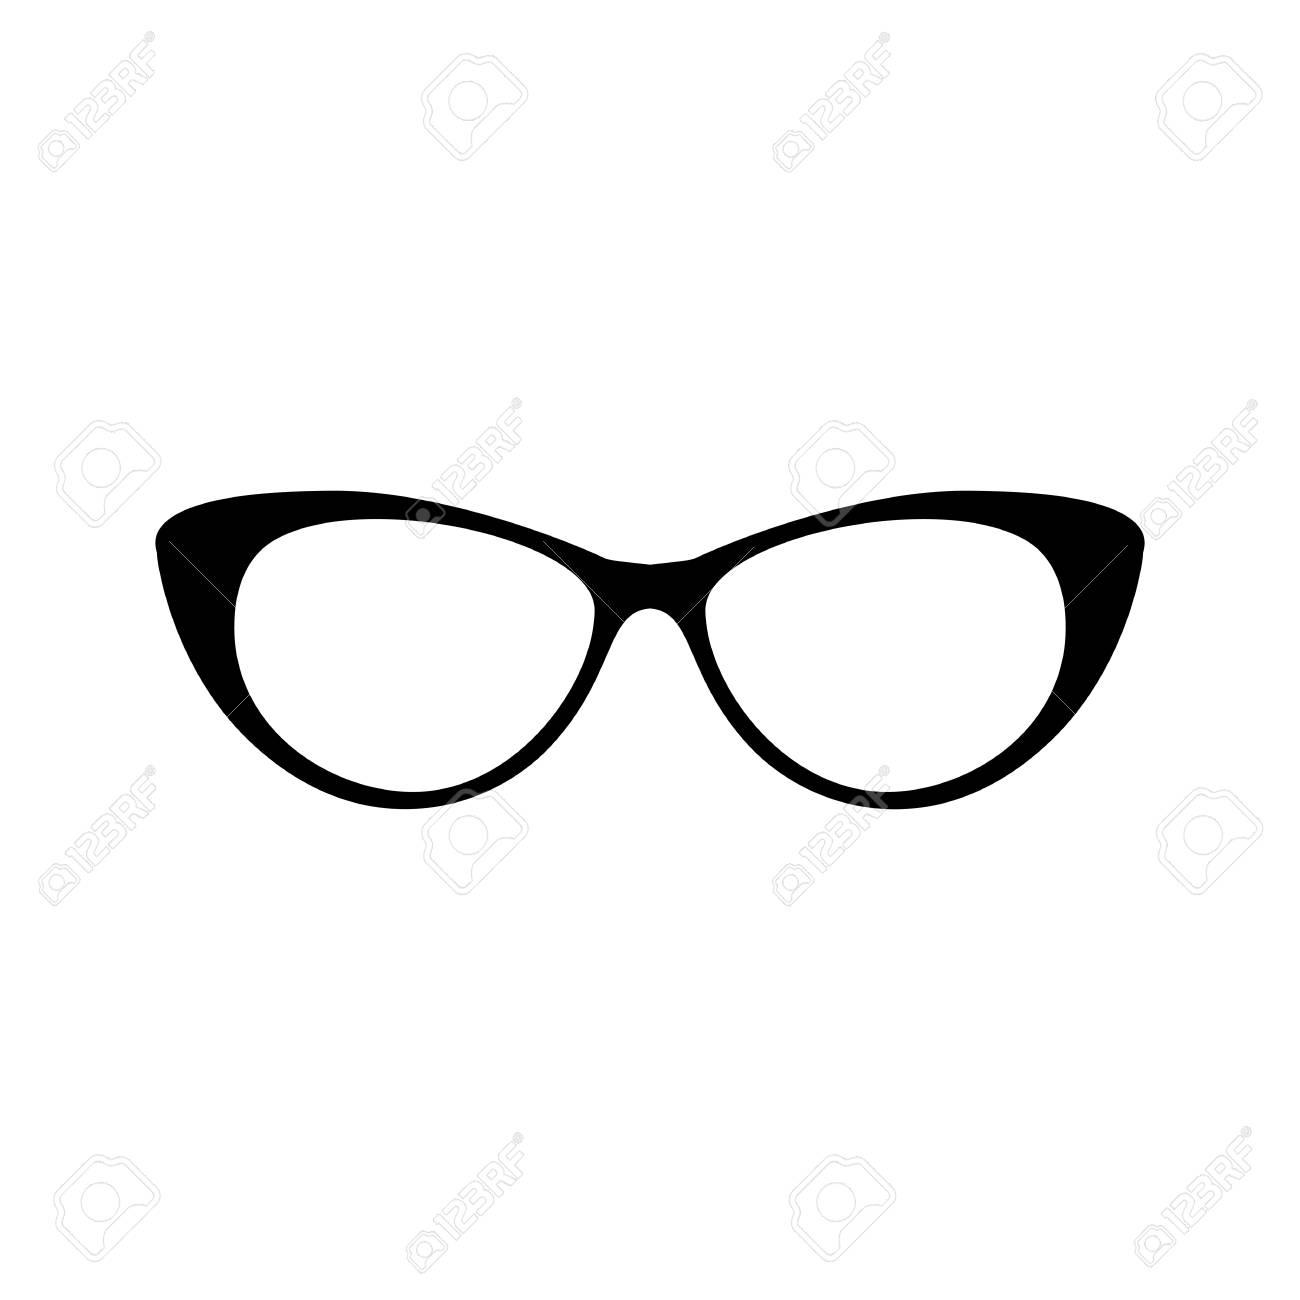 b739067627 Set Of Various Glasses. Stylish Sunglasses For Women